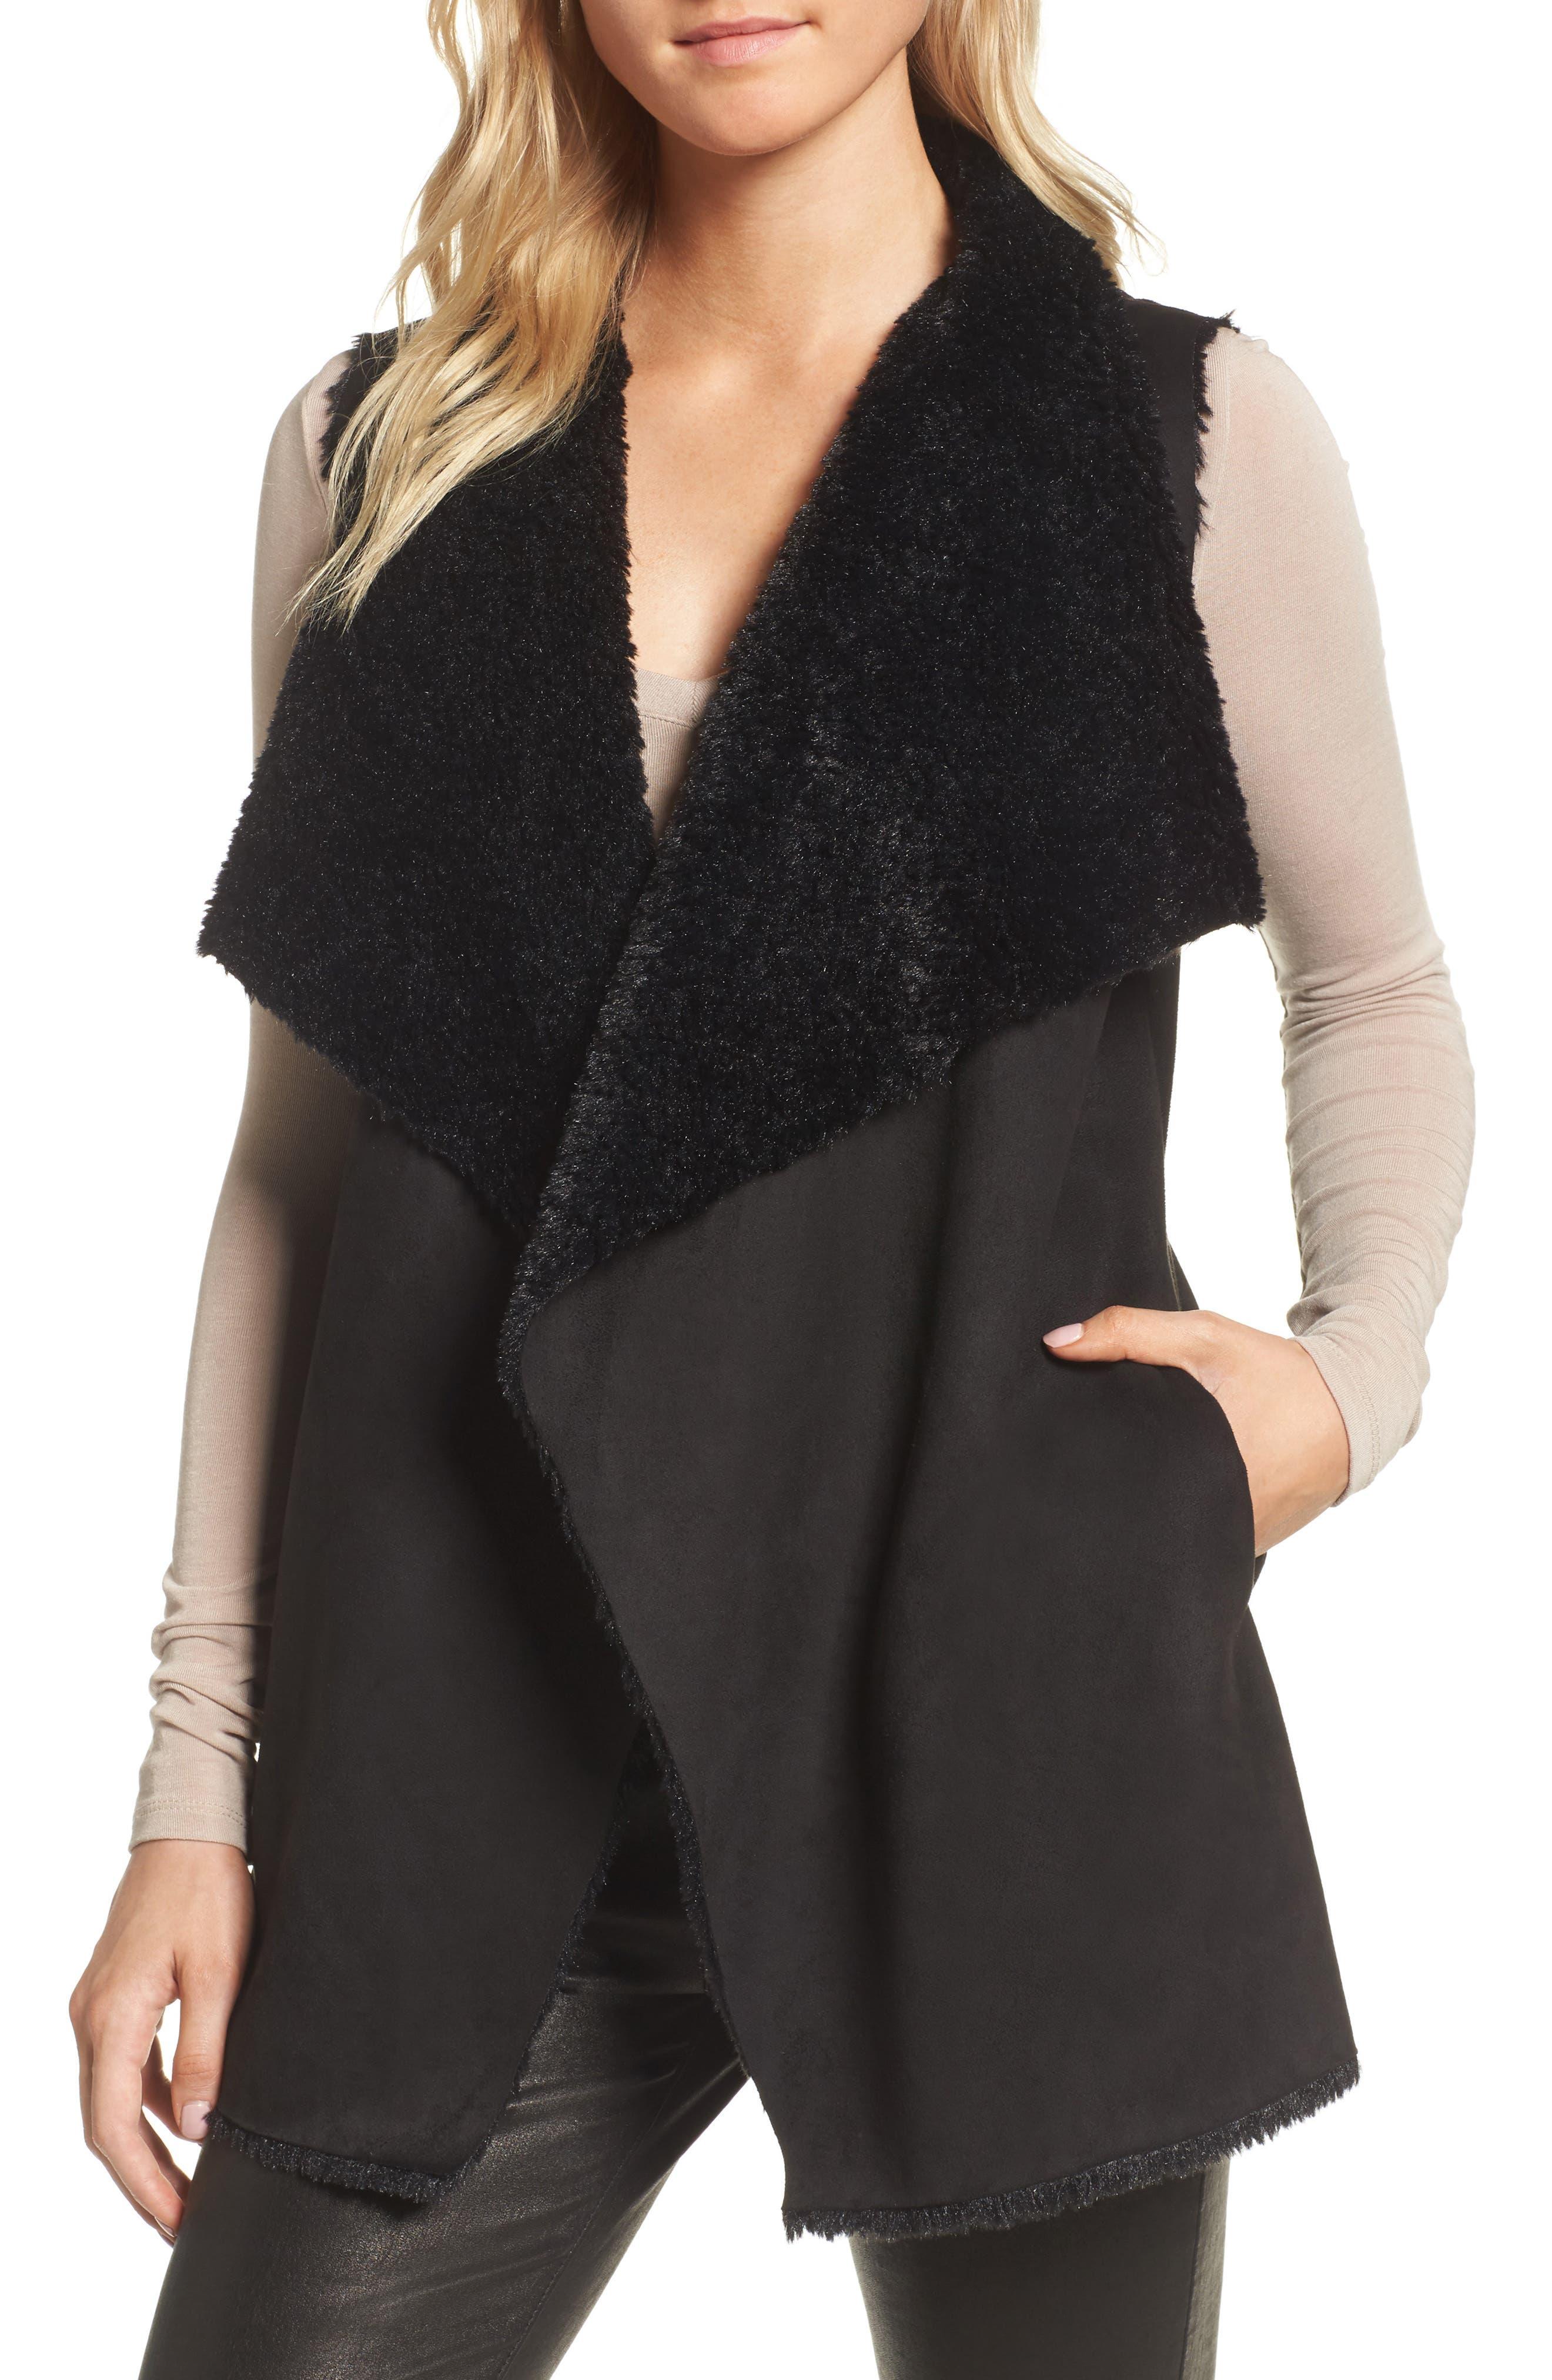 Avalonia Faux Shearling Vest,                             Main thumbnail 1, color,                             001